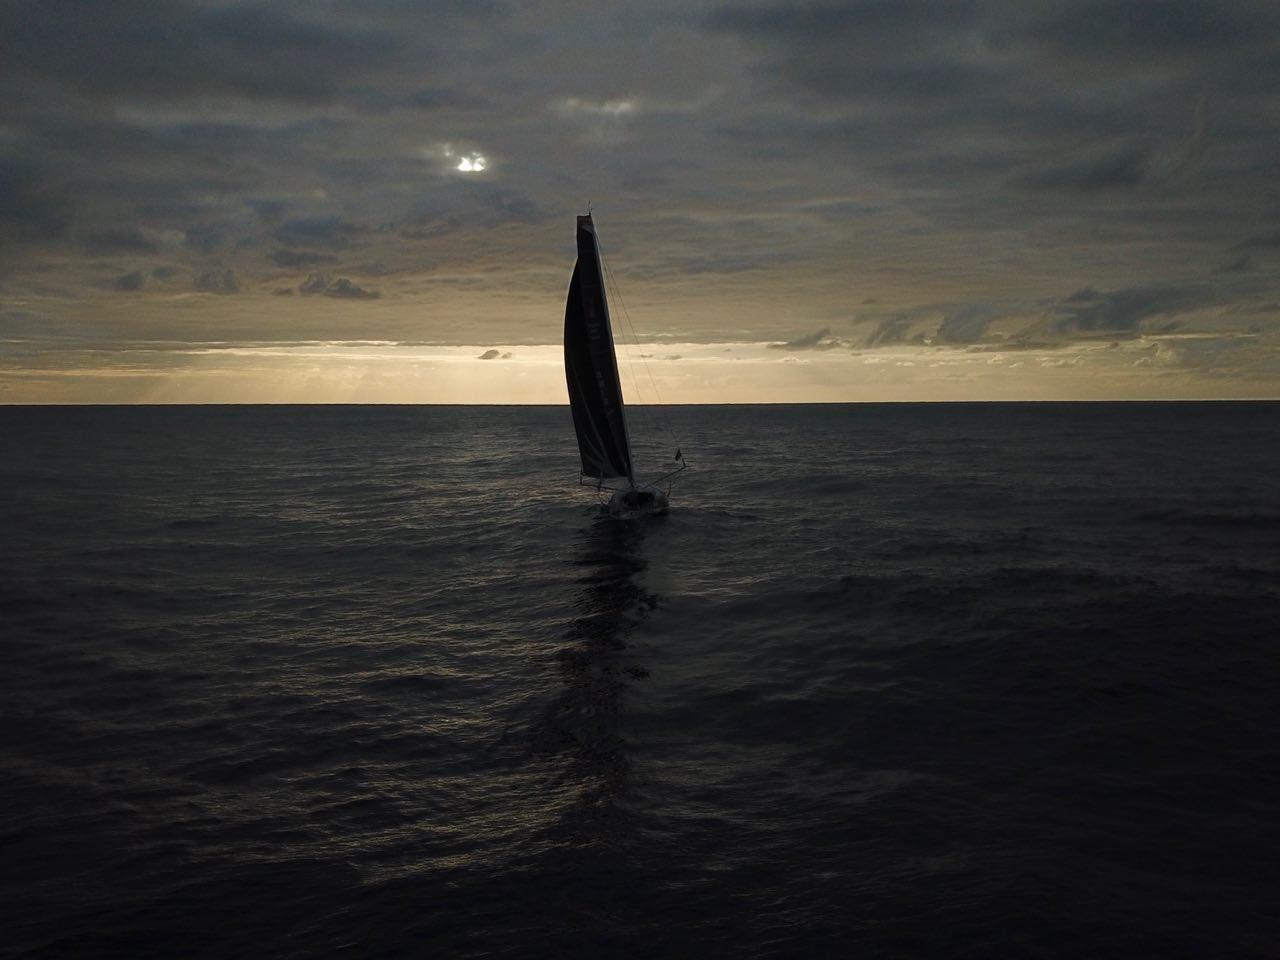 photo:@borisherrmann;desc:Malizia II sailing into the night and onwards to New York